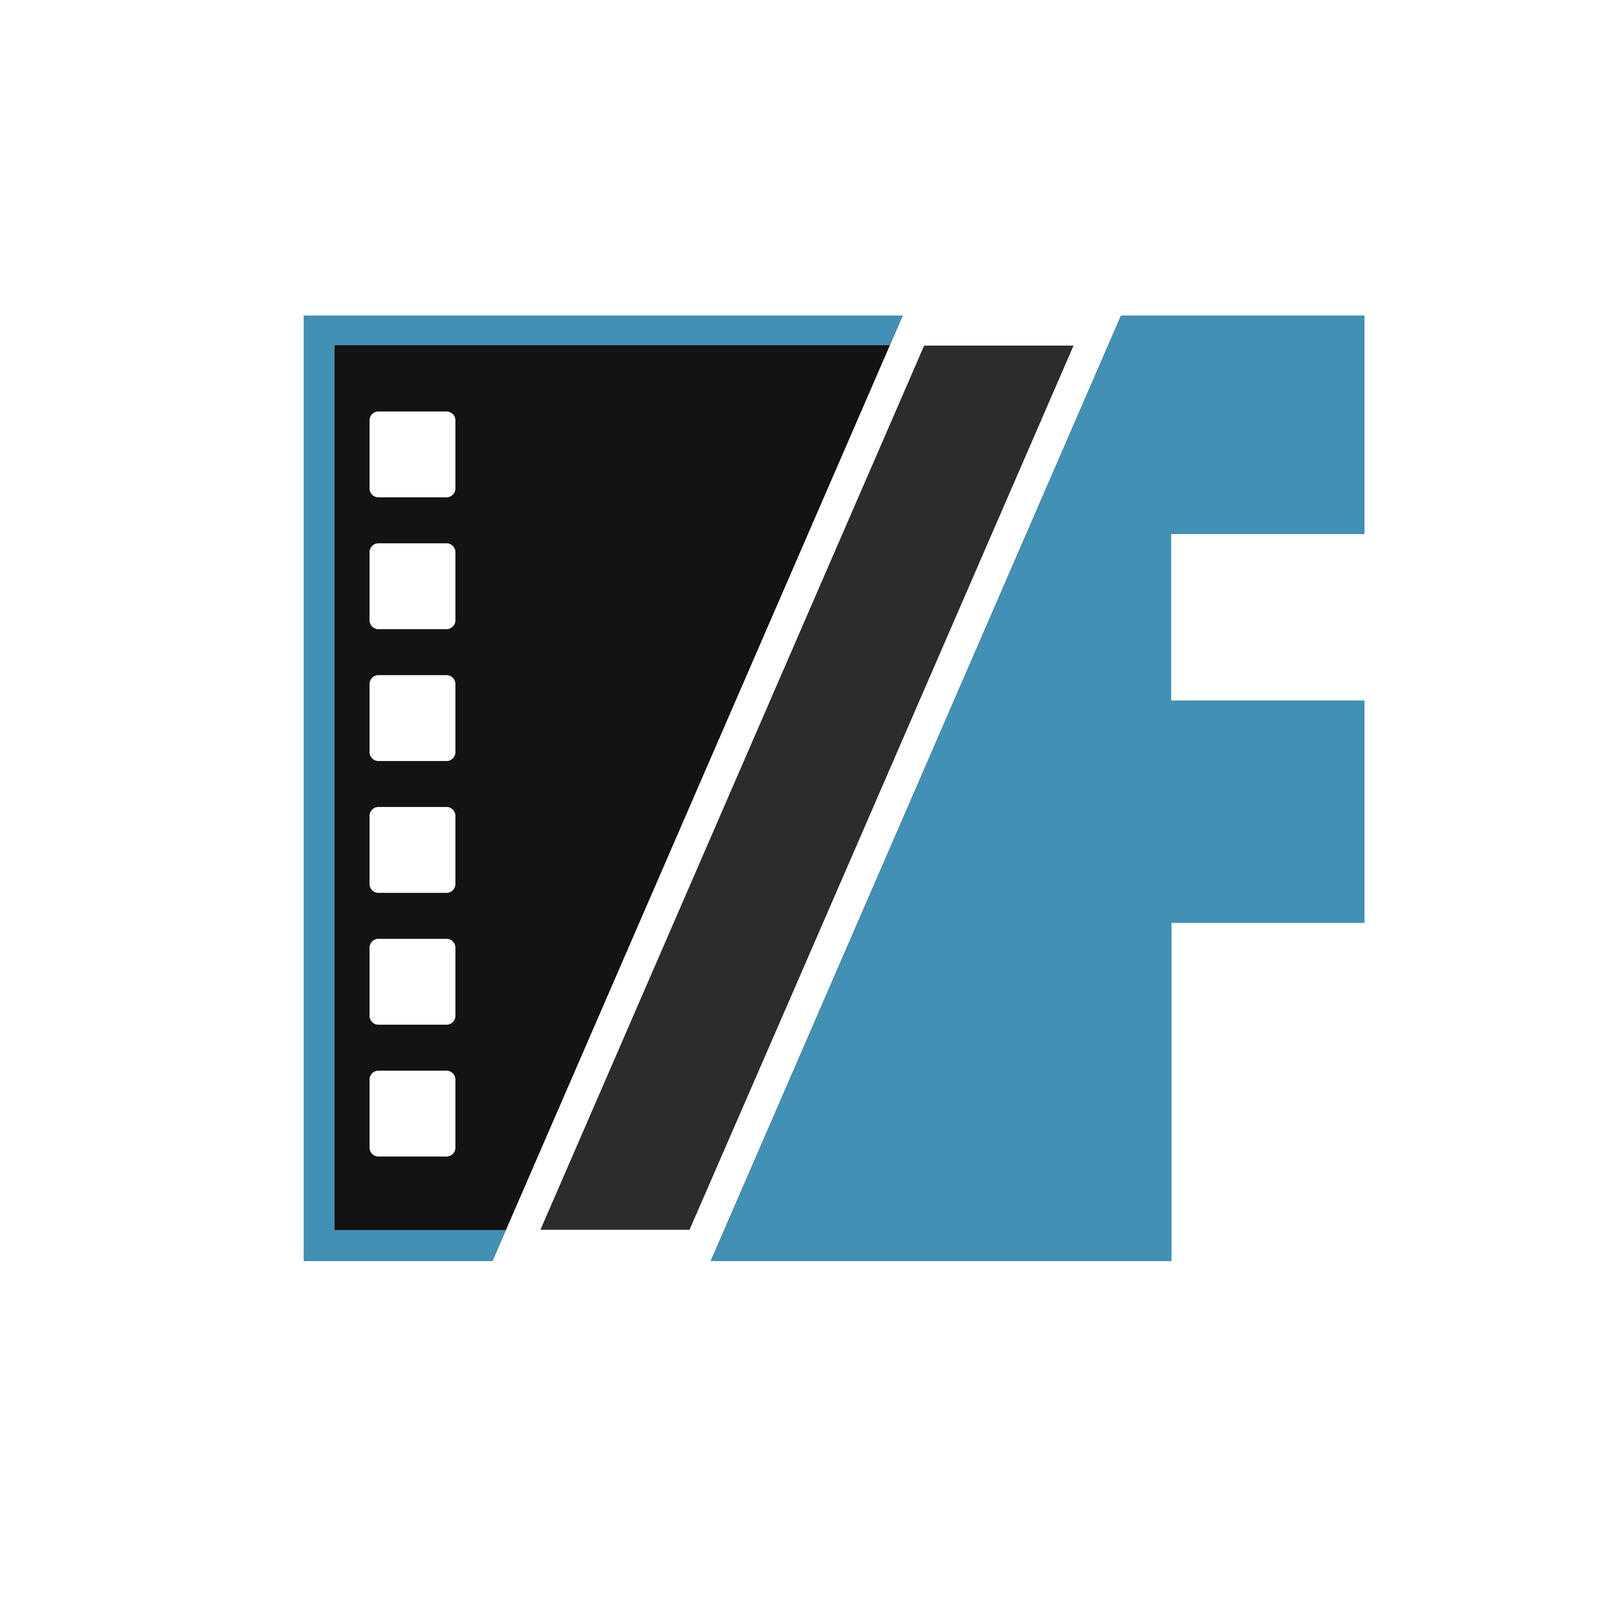 Slashfilmcast